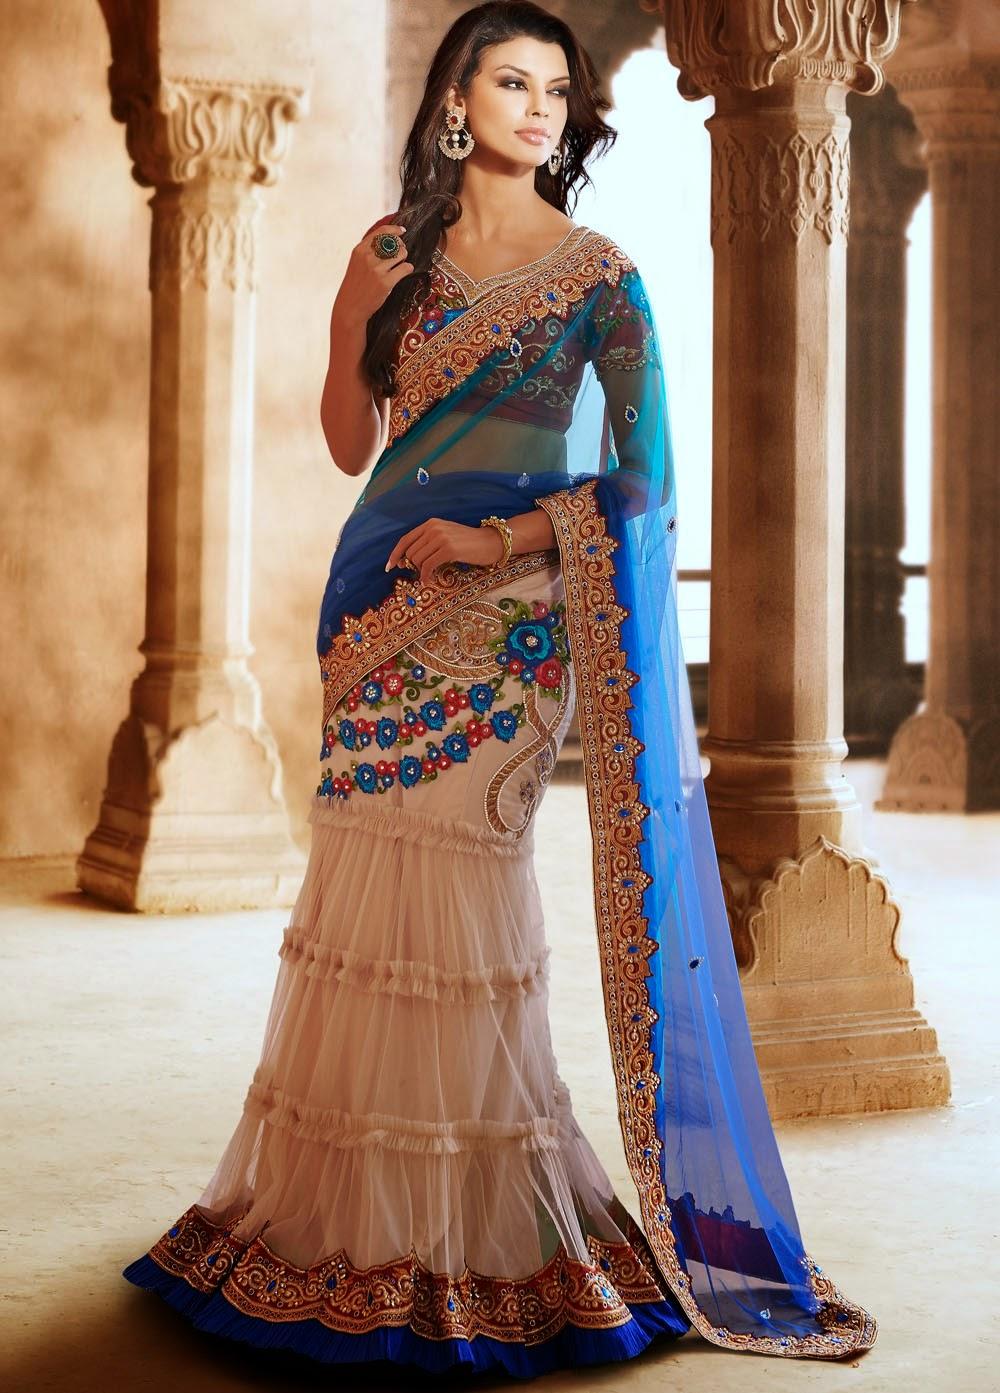 Dreadful%2BLehenga%2BCholi%2B(19) - Nice Traditional Wedding Dresses